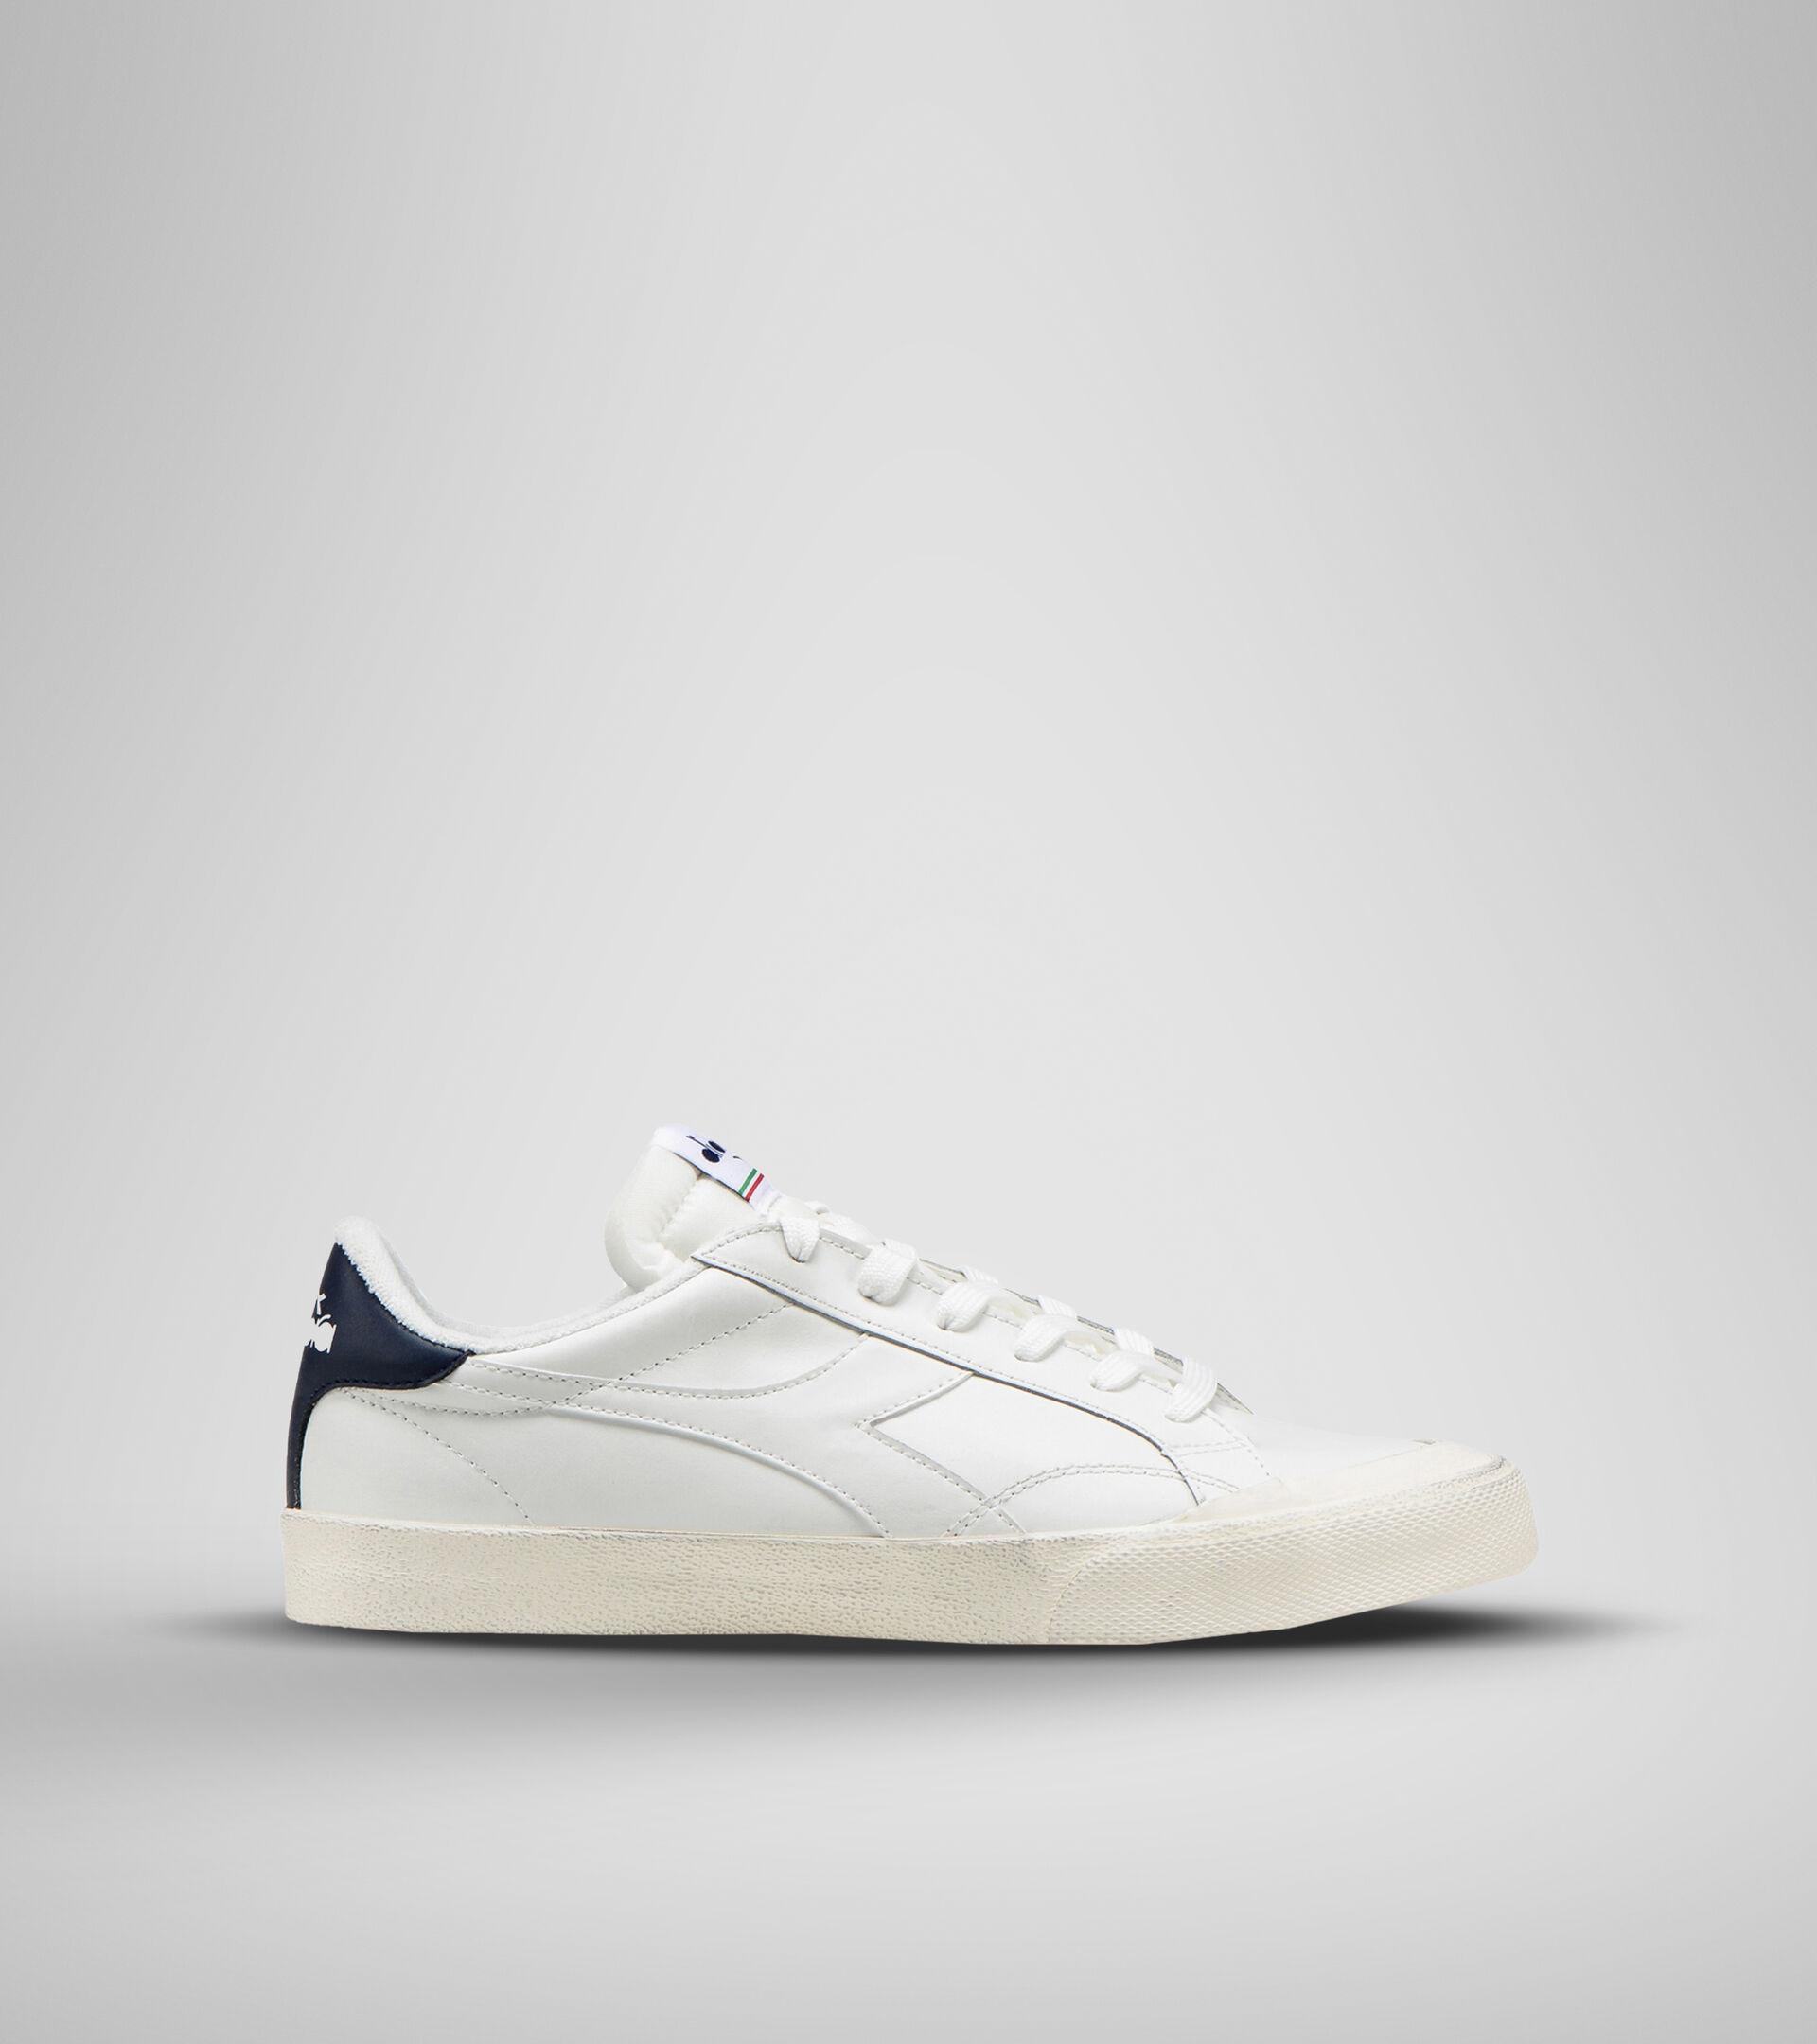 Footwear Sportswear UNISEX MELODY LEATHER DIRTY WHITE/BLUE CORSAIR Diadora